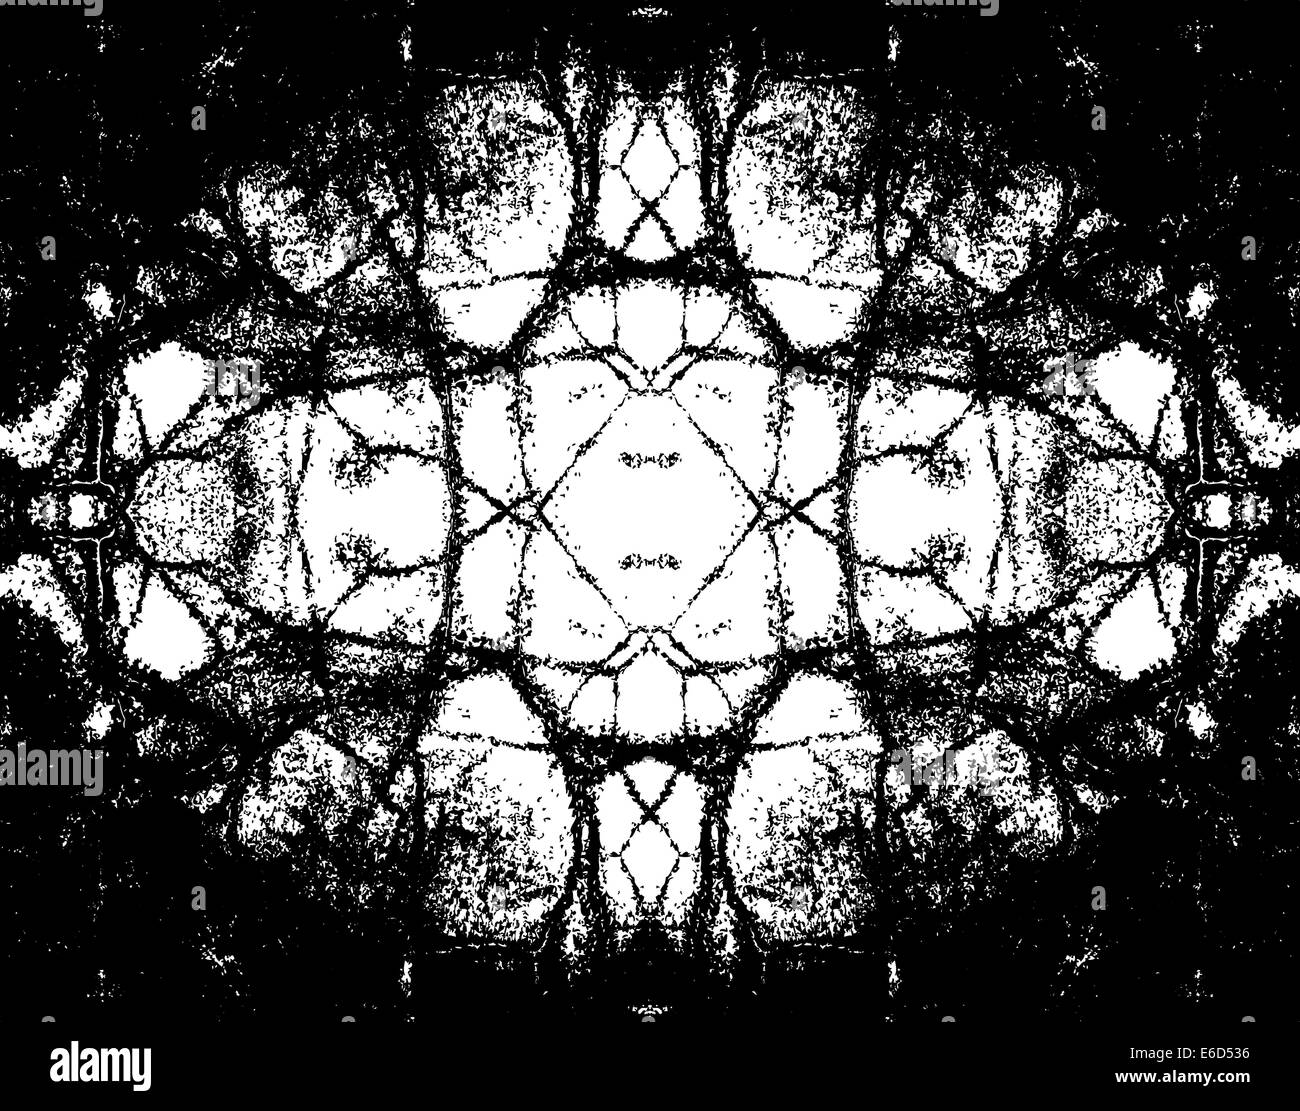 Editable vector illustration of a symmetrical grunge pattern - Stock Image